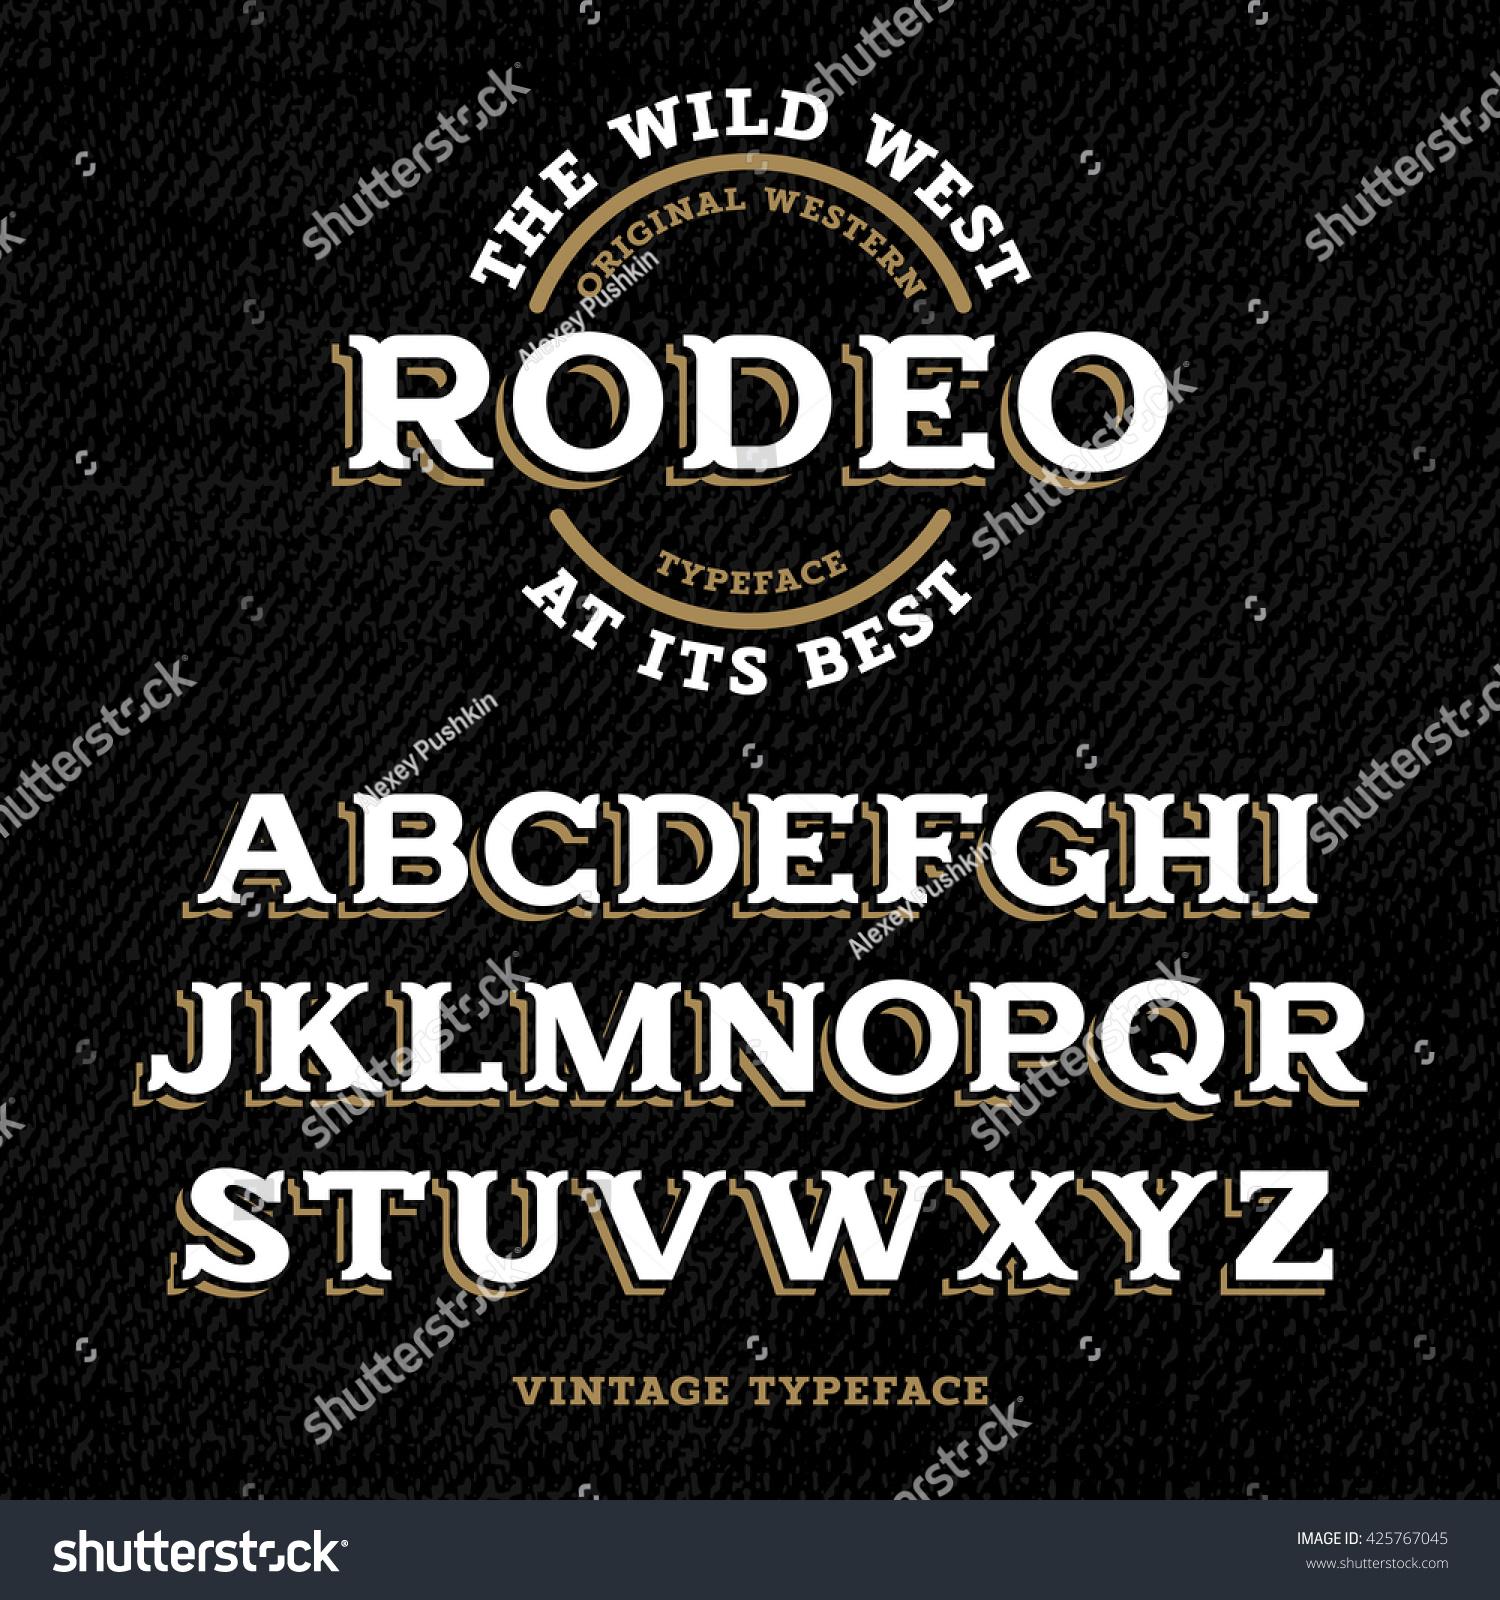 Wild West Typeface Retro Alphabet Western Stock Vector